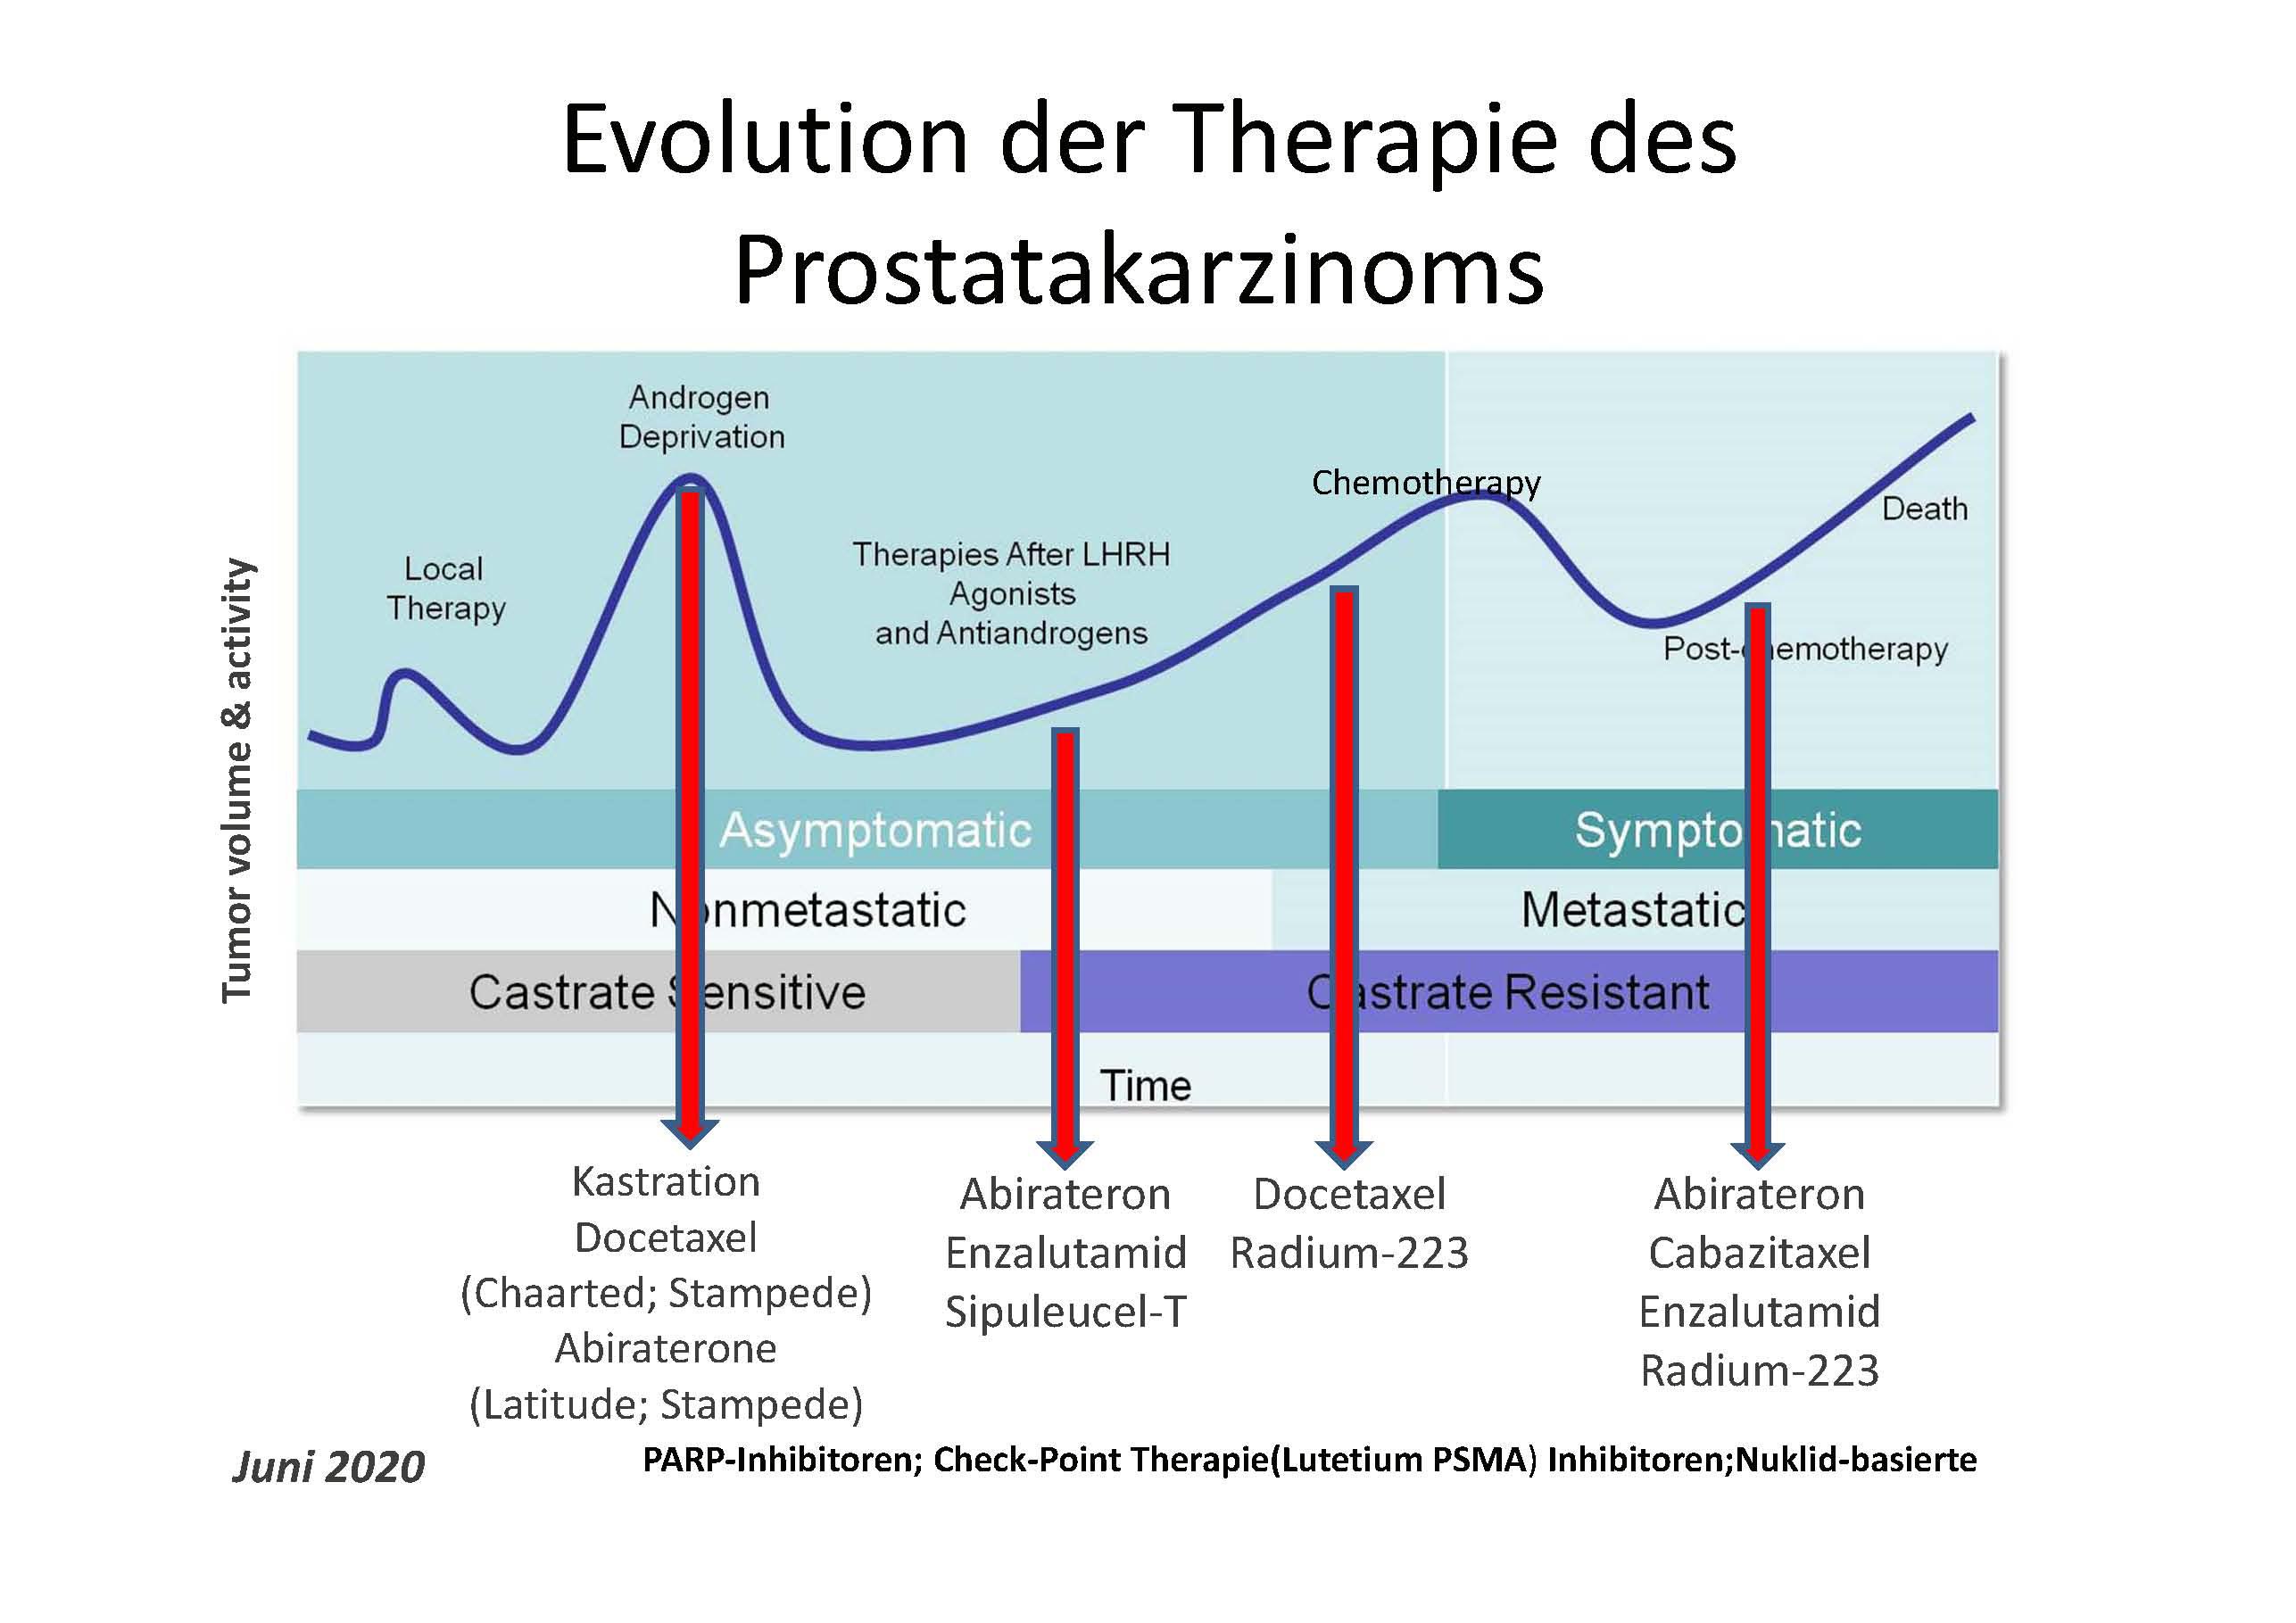 Entwic klung Therapie Prostatakrebs